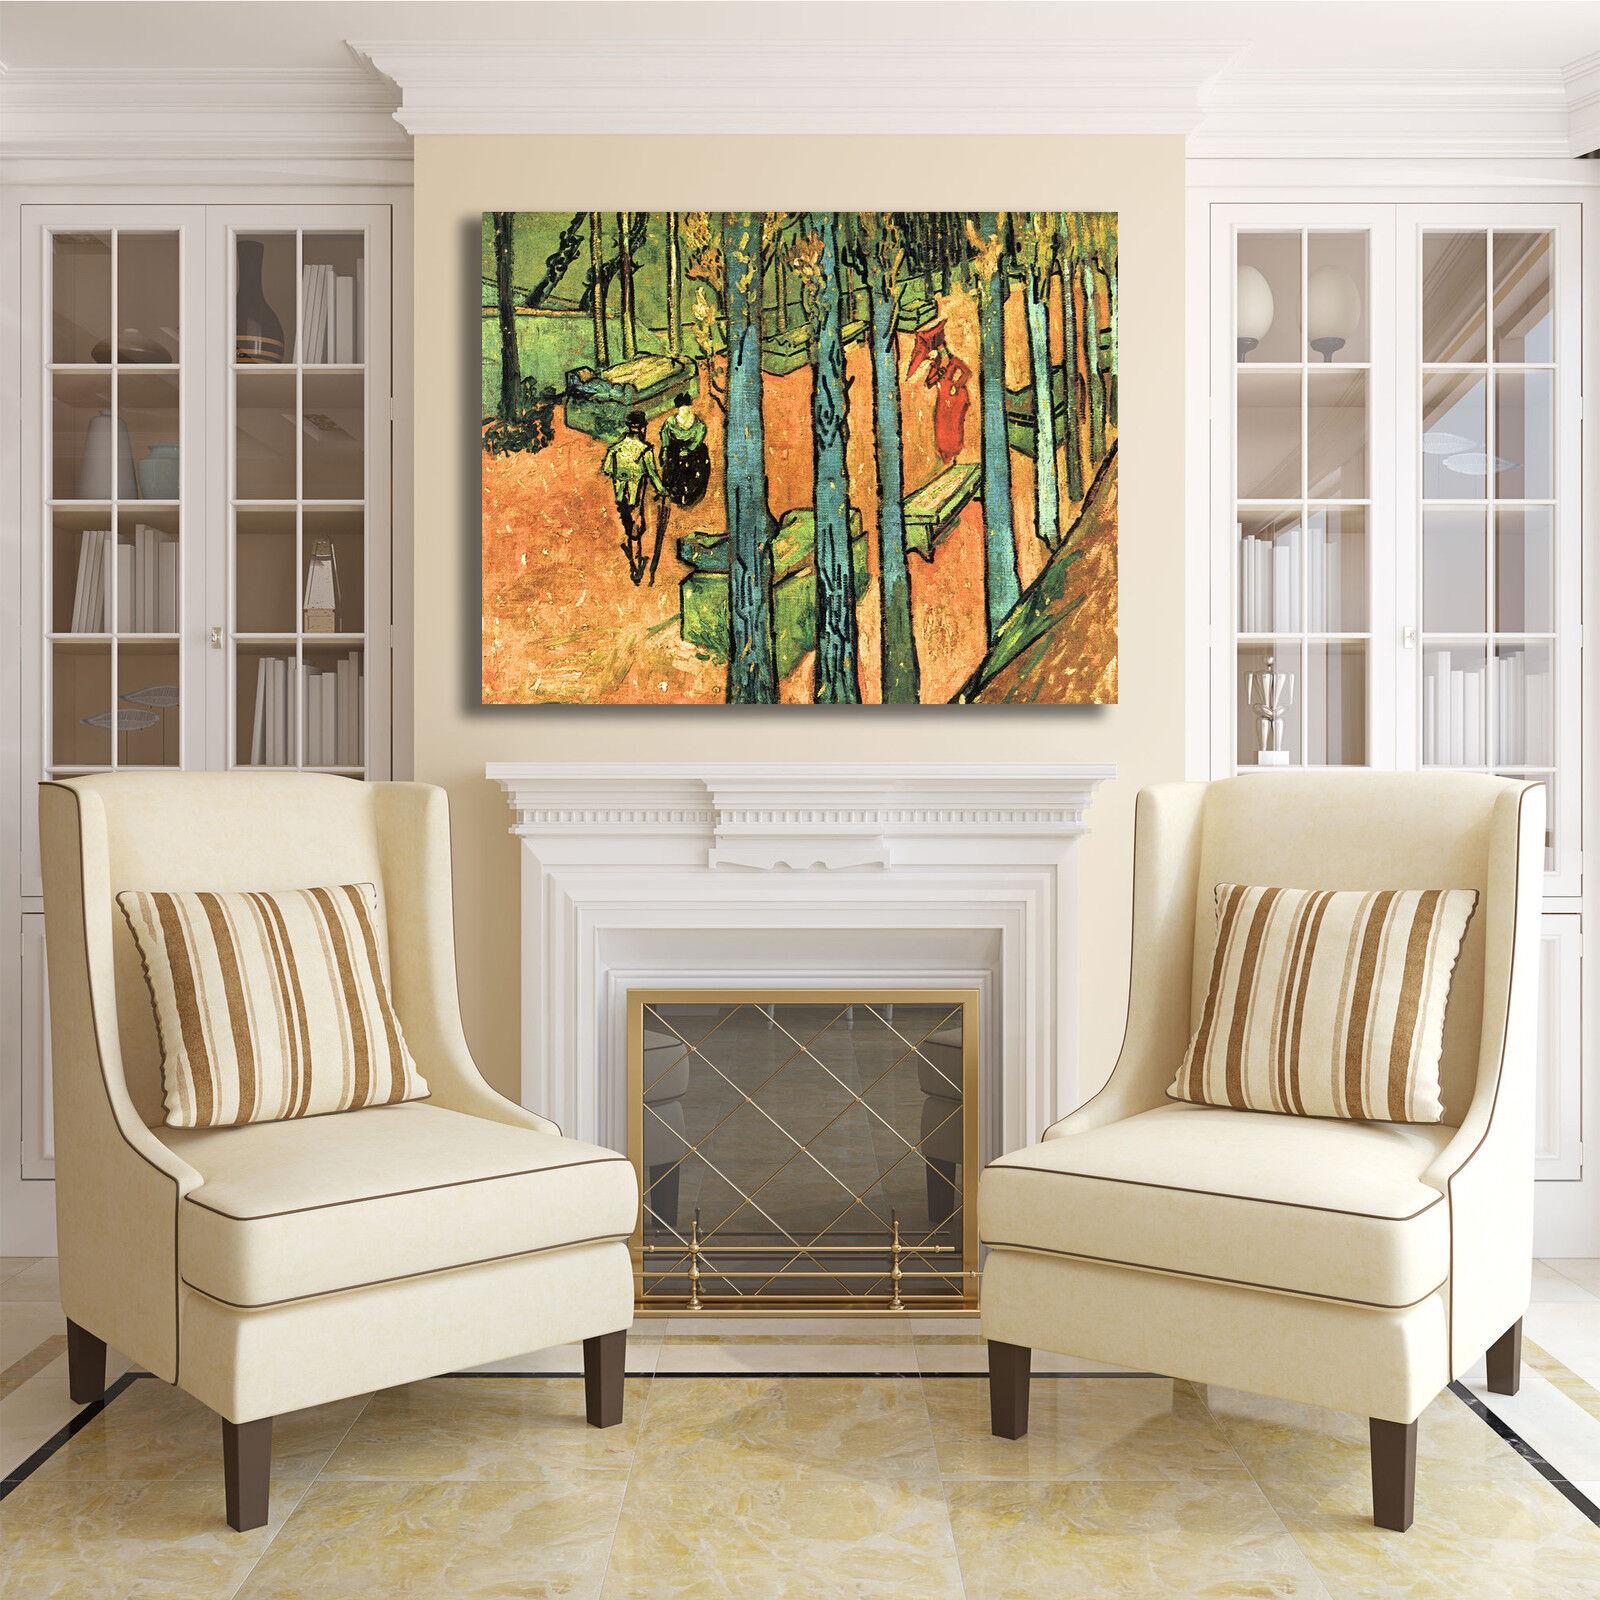 Van Gogh les alyscamps design quadro stampa stampa stampa tela dipinto telaio arrossoo casa 21c924